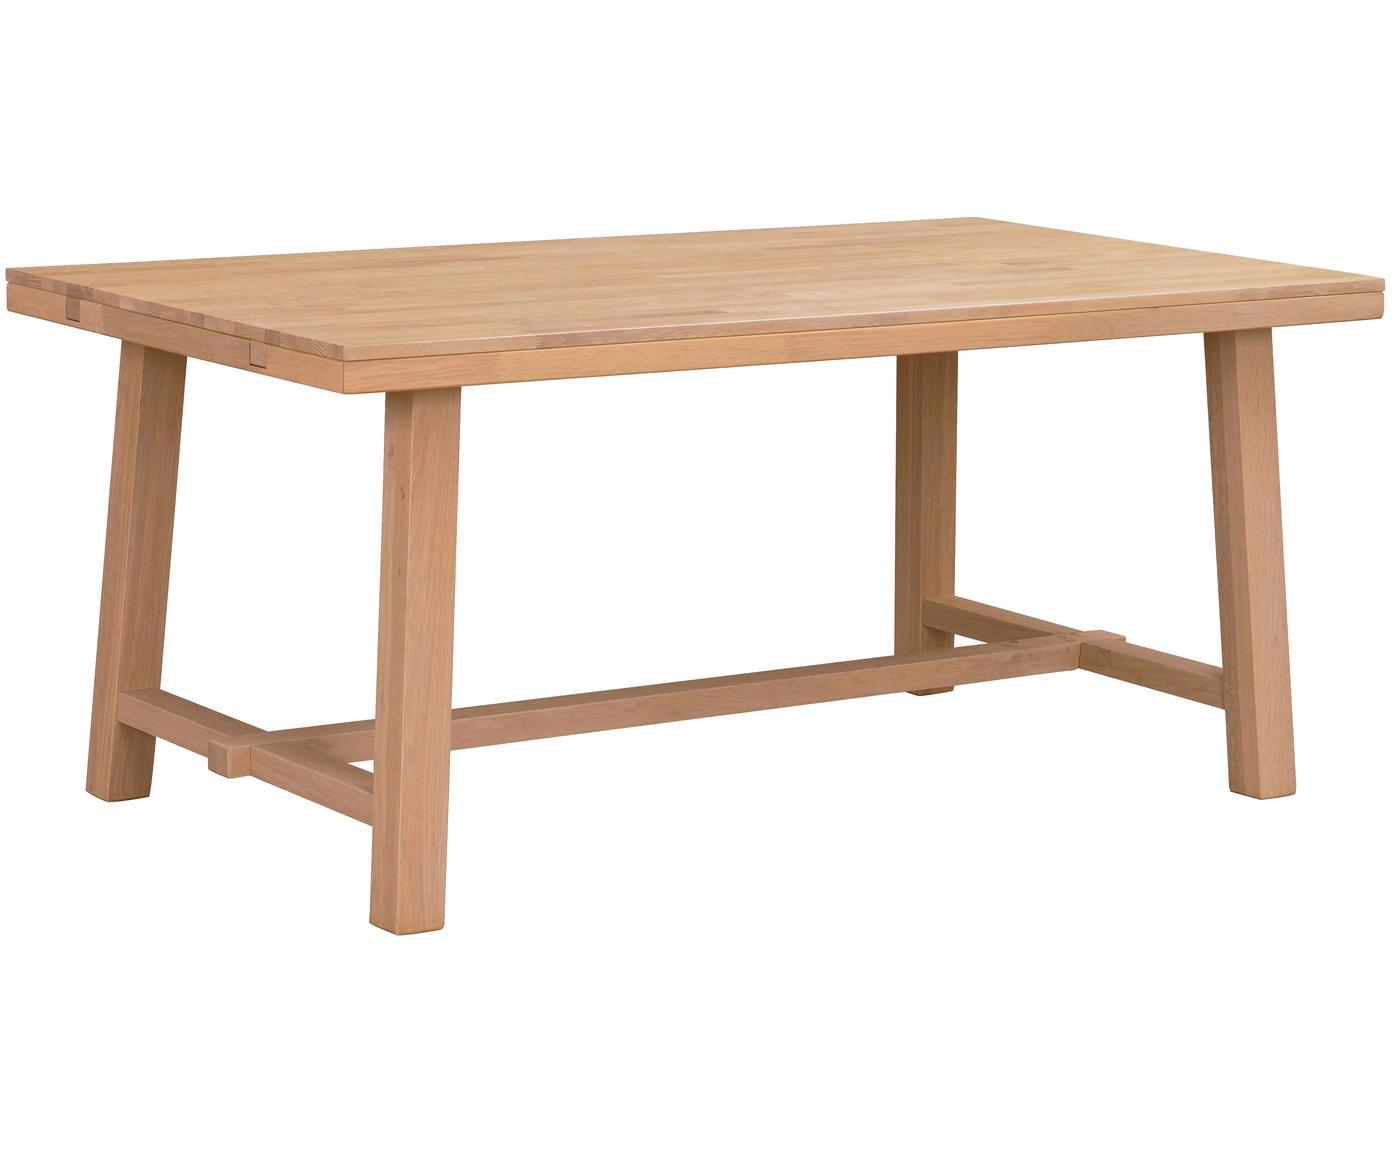 Mesa de comedor extensible de madera maciza Brooklyn, Madera de roble maciza cepillada y lacada clara, Roble, An 170-220 x F 95 cm